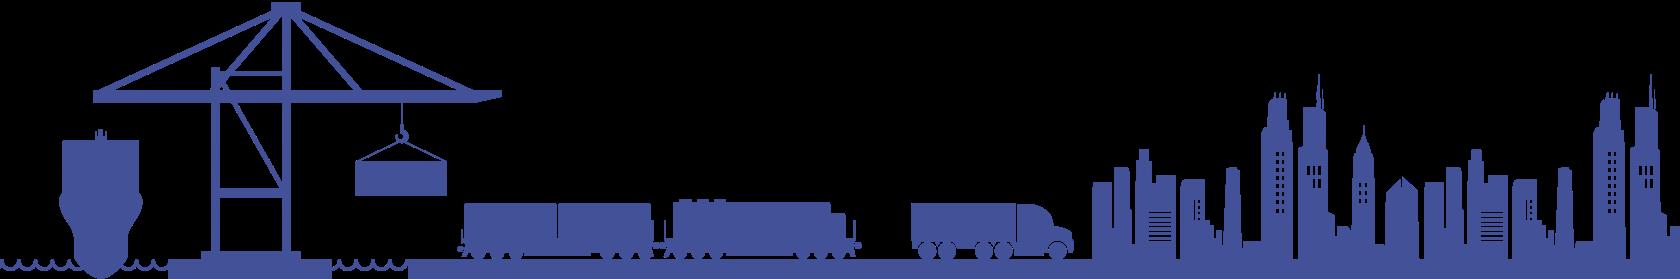 Intermodal-vita24-1680x550